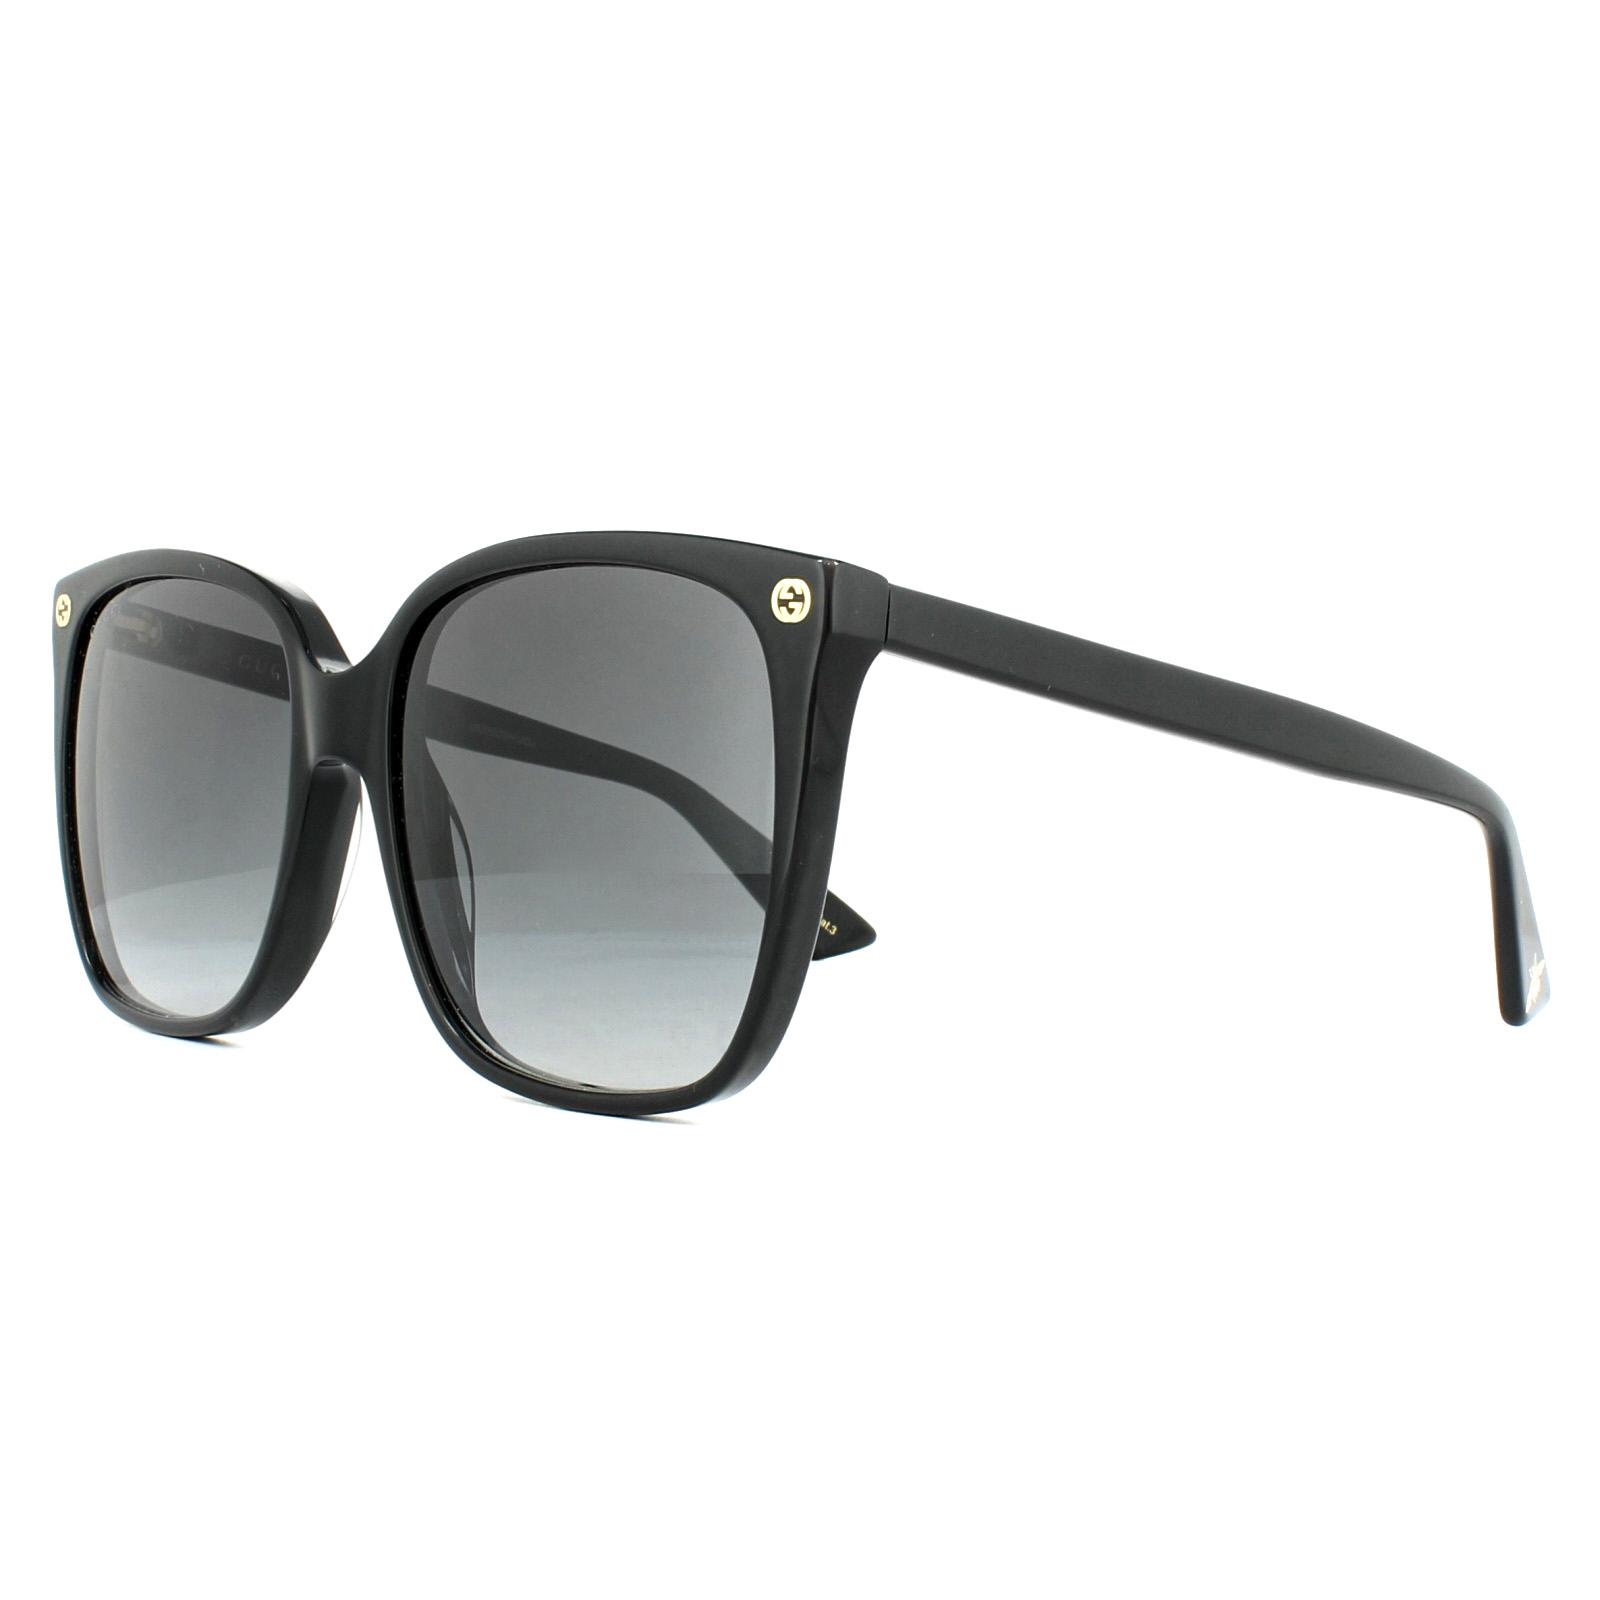 fac94dcd16b Sentinel Gucci Sunglasses GG0022S 001 Black Grey Gradient